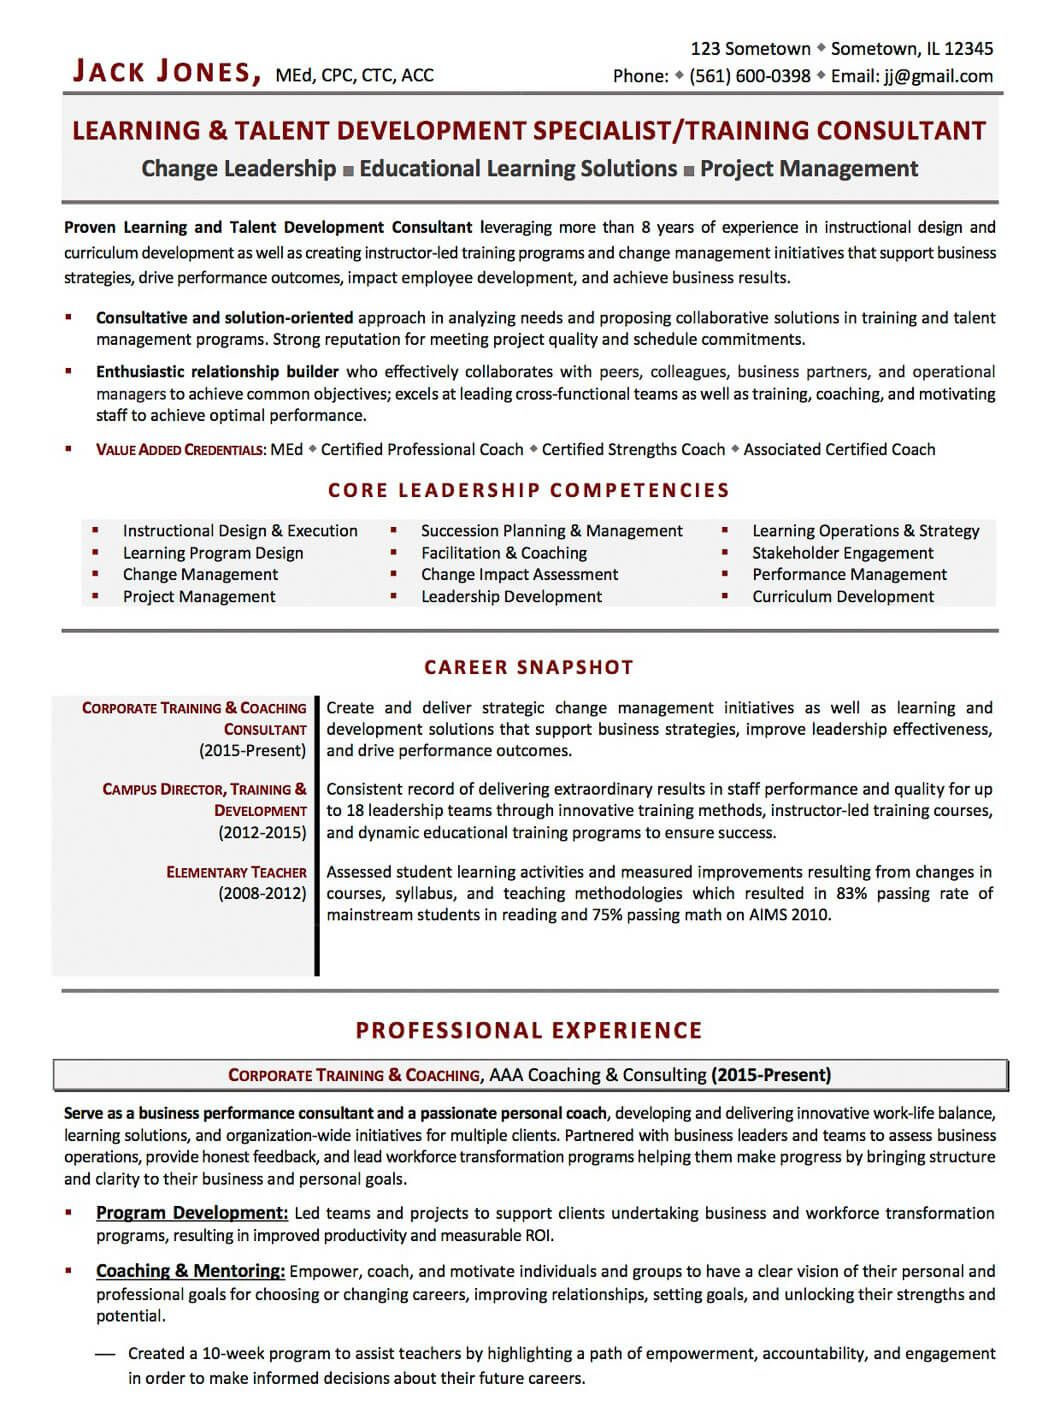 resume for business development consultant